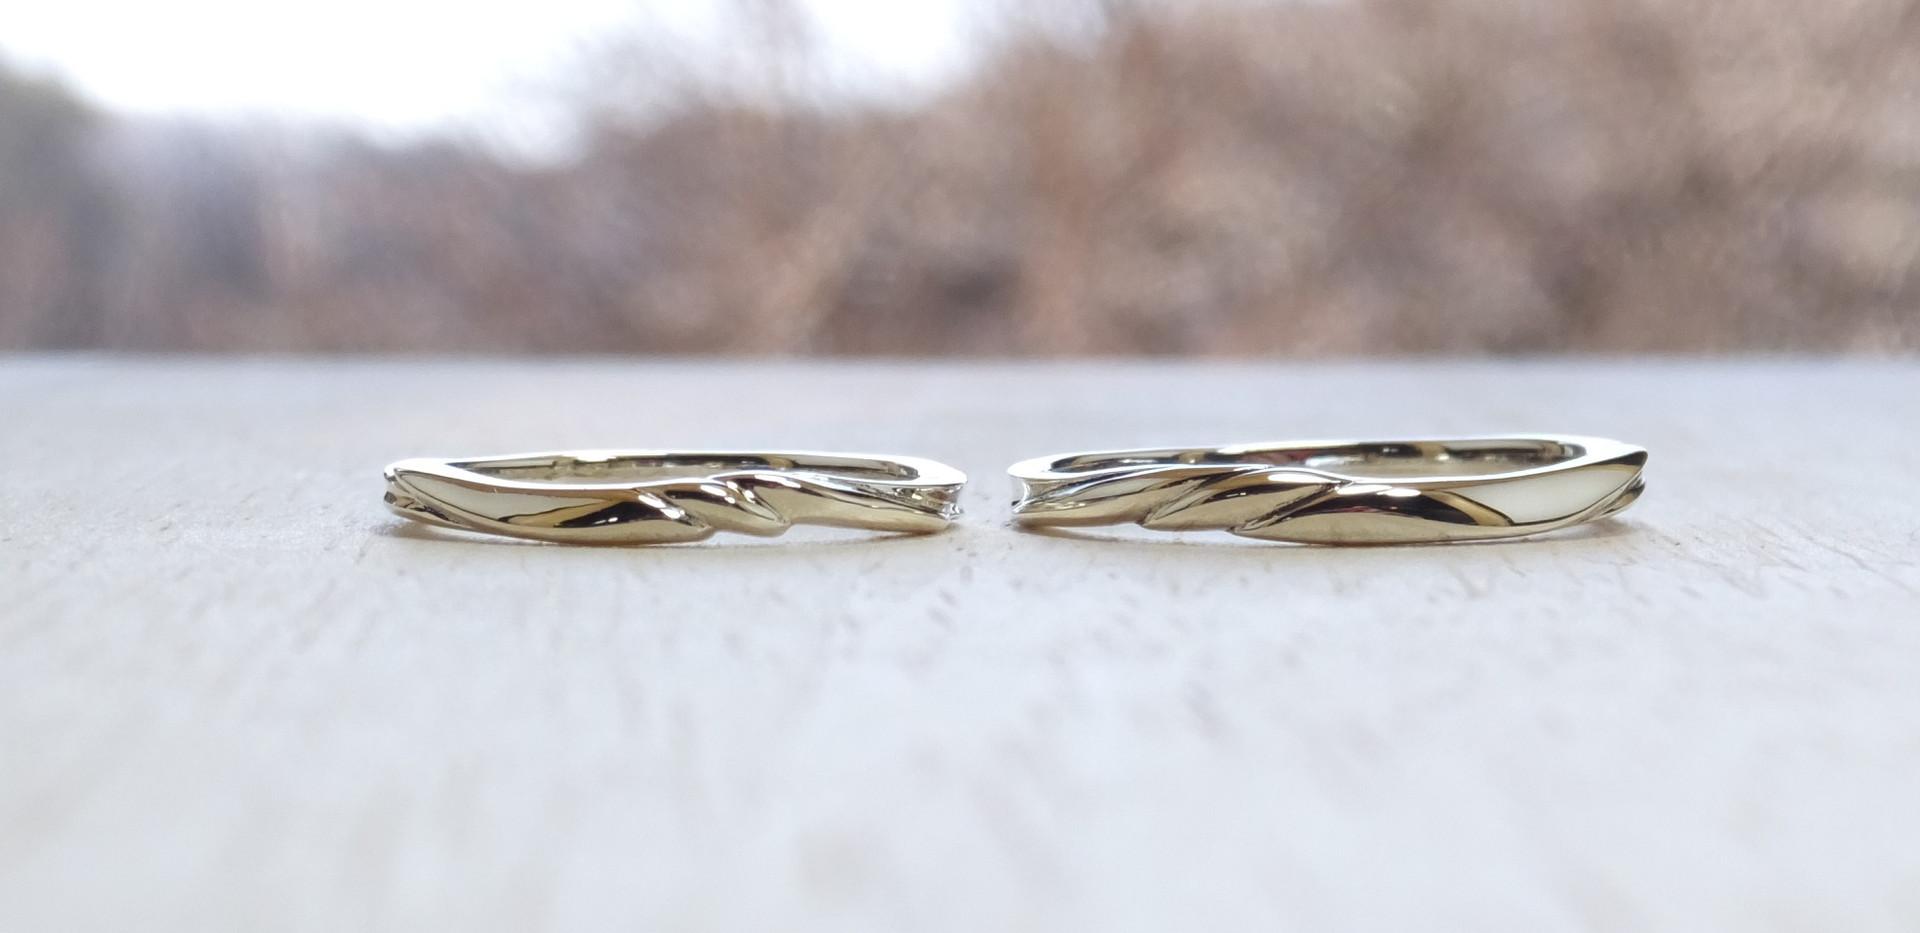 genchou design 手作り結婚指輪〈tsubame/ツバメ〉 K18ホワイトゴールド 鏡面仕上げ